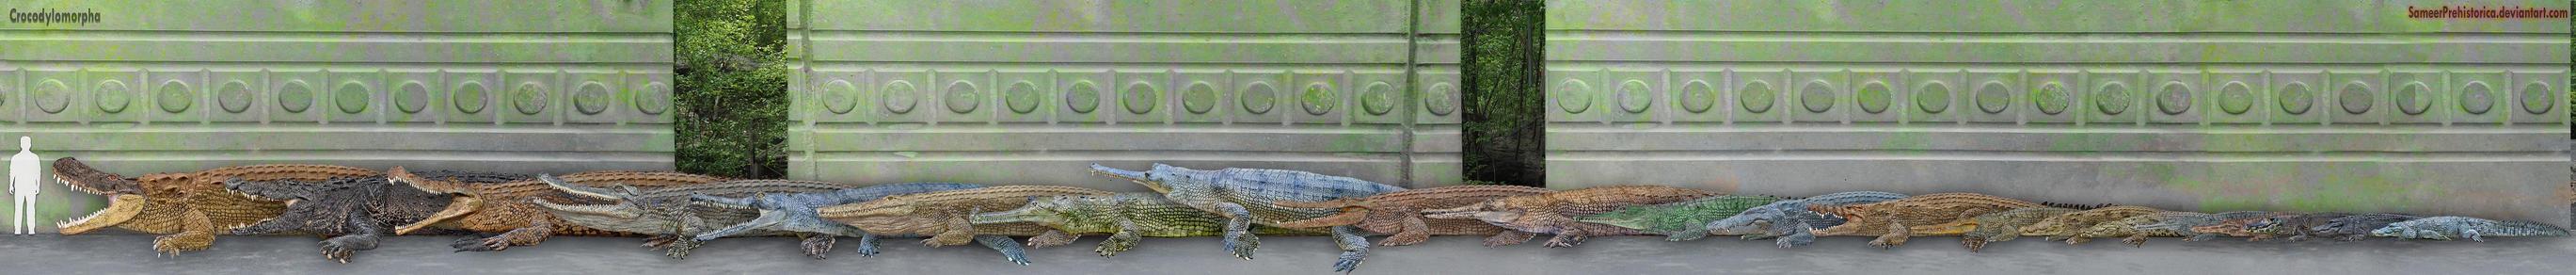 Crocodylomorpha by SameerPrehistorica